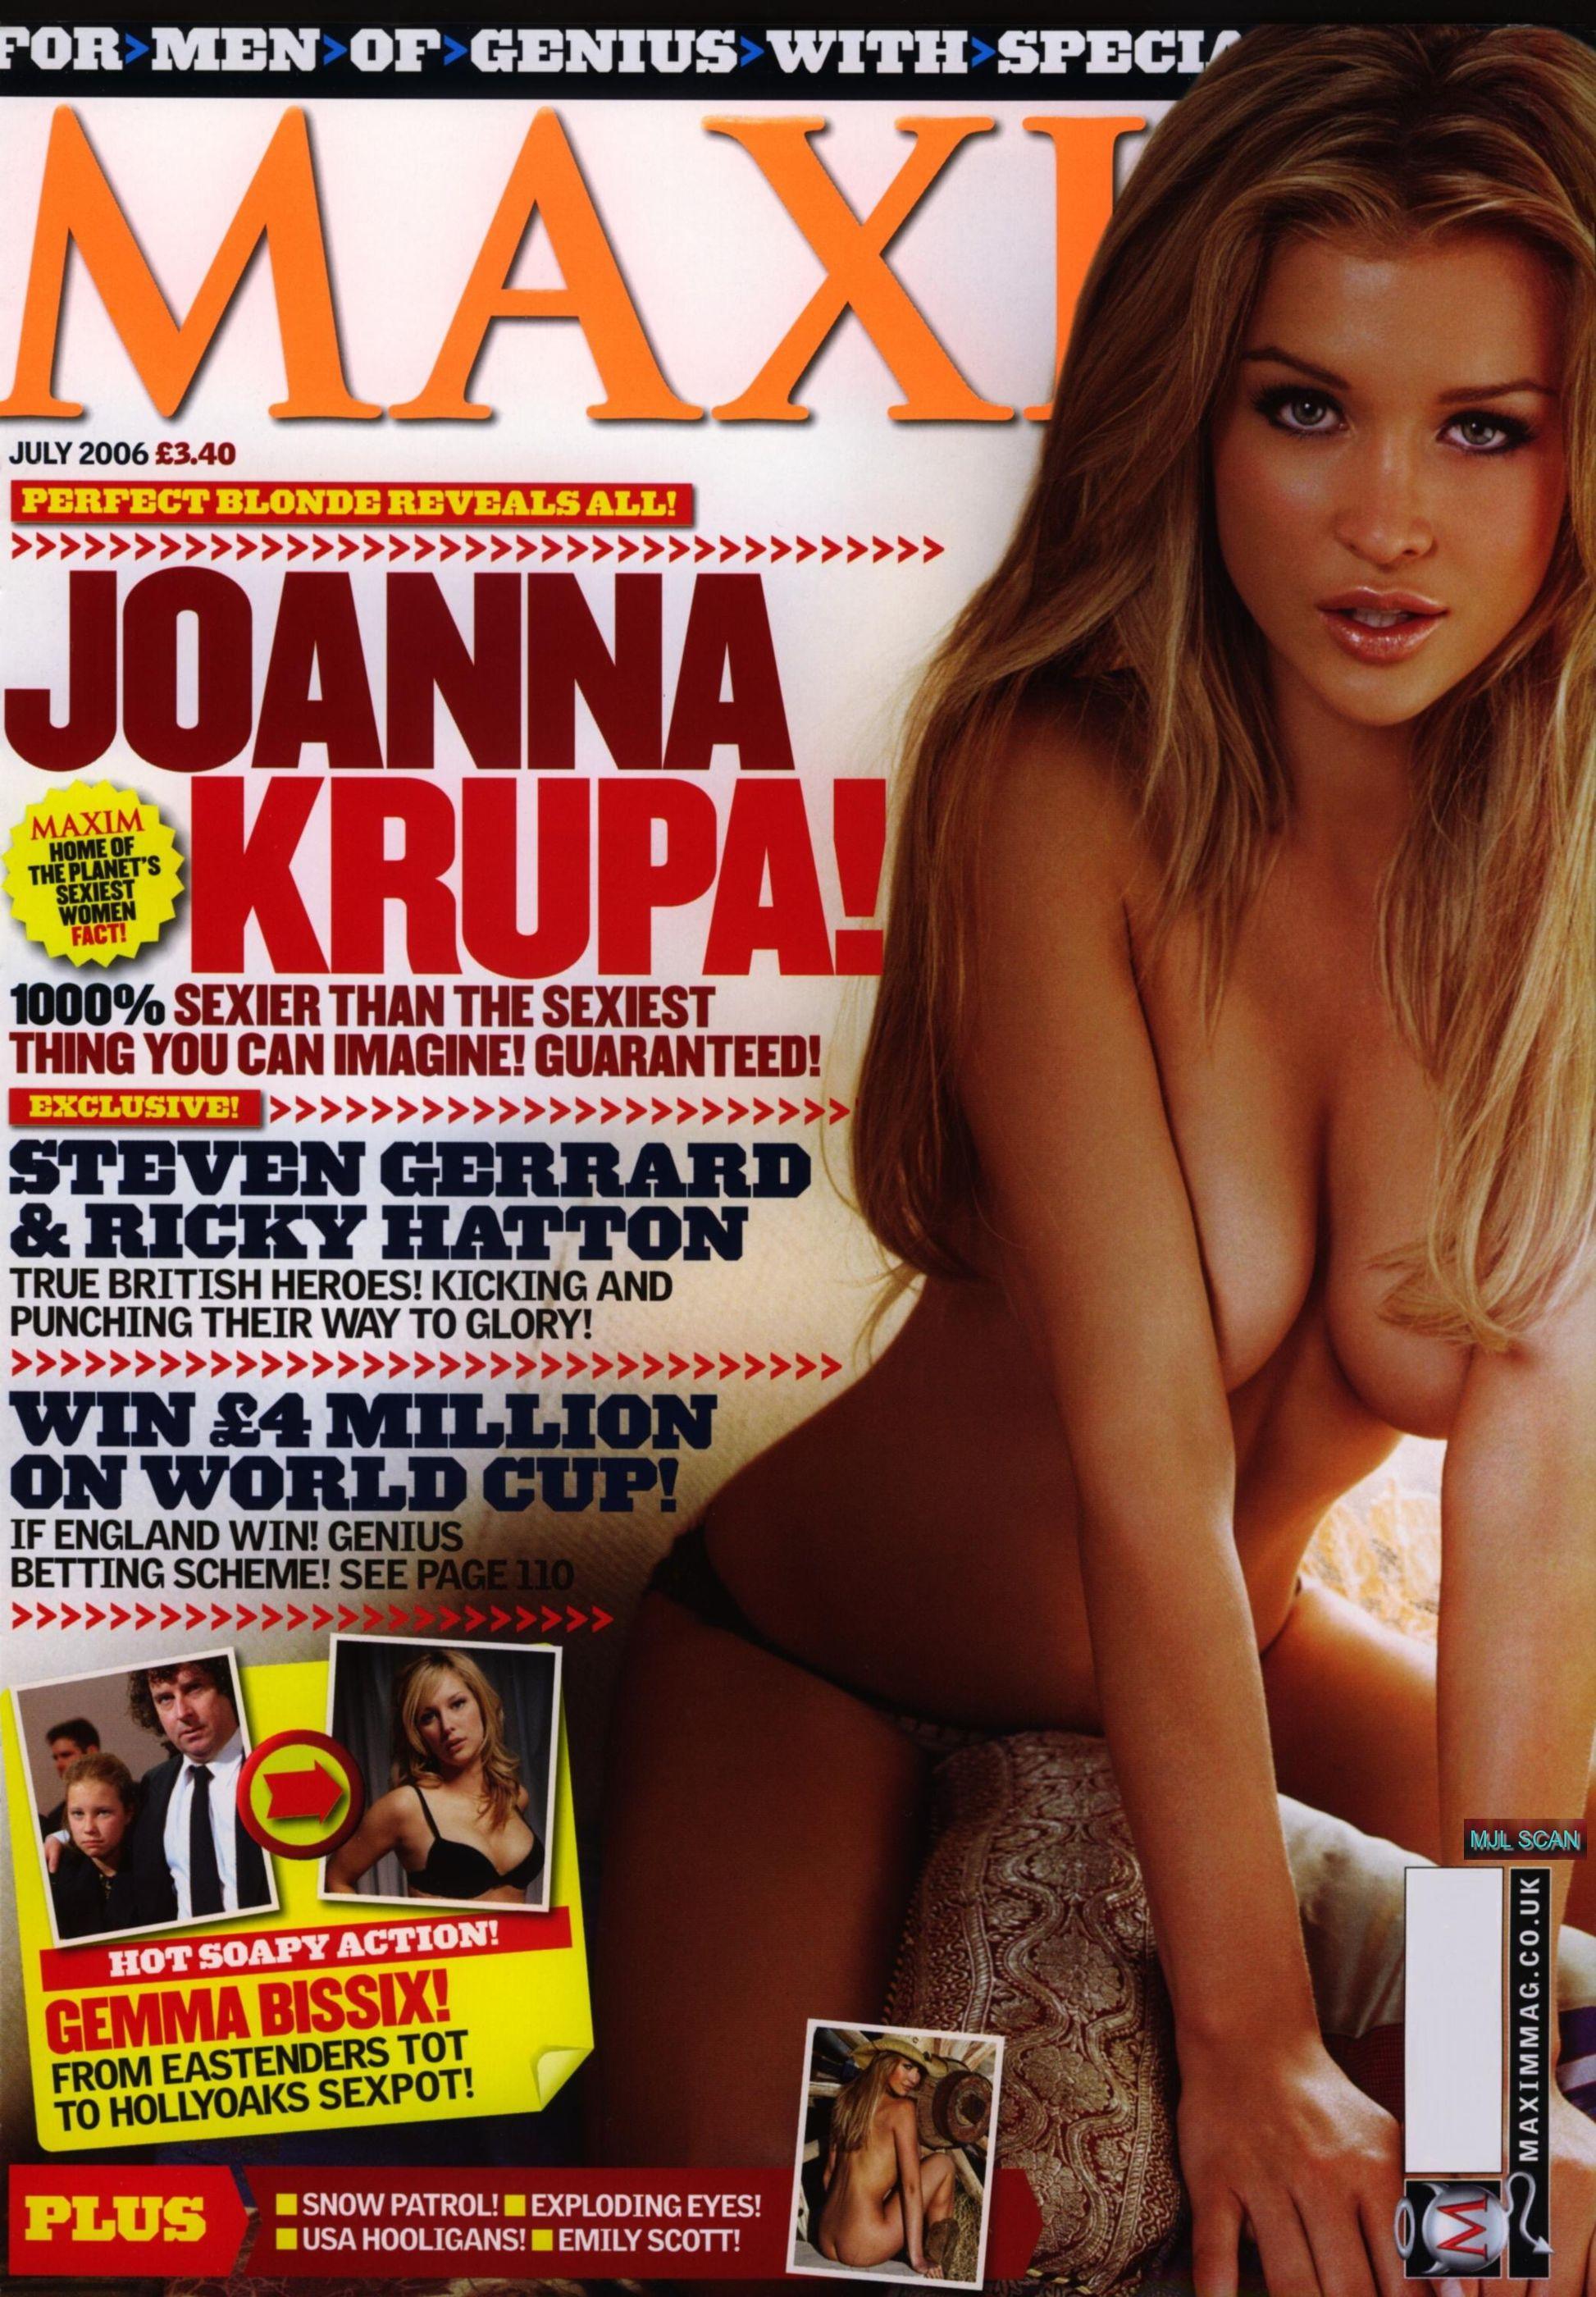 69809_joanna_krupa_2800_cover_123_83lo.jpg